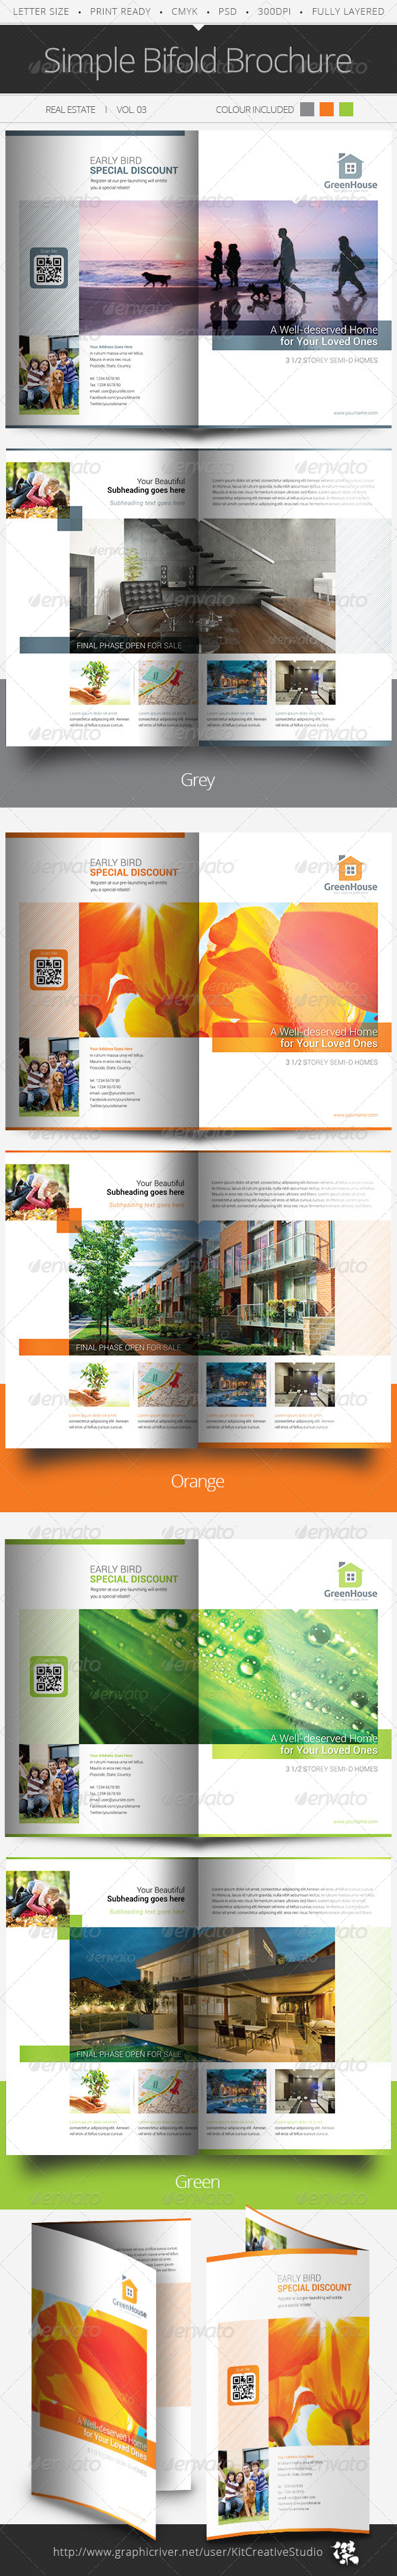 Simple Bifold Brochure Vol.03